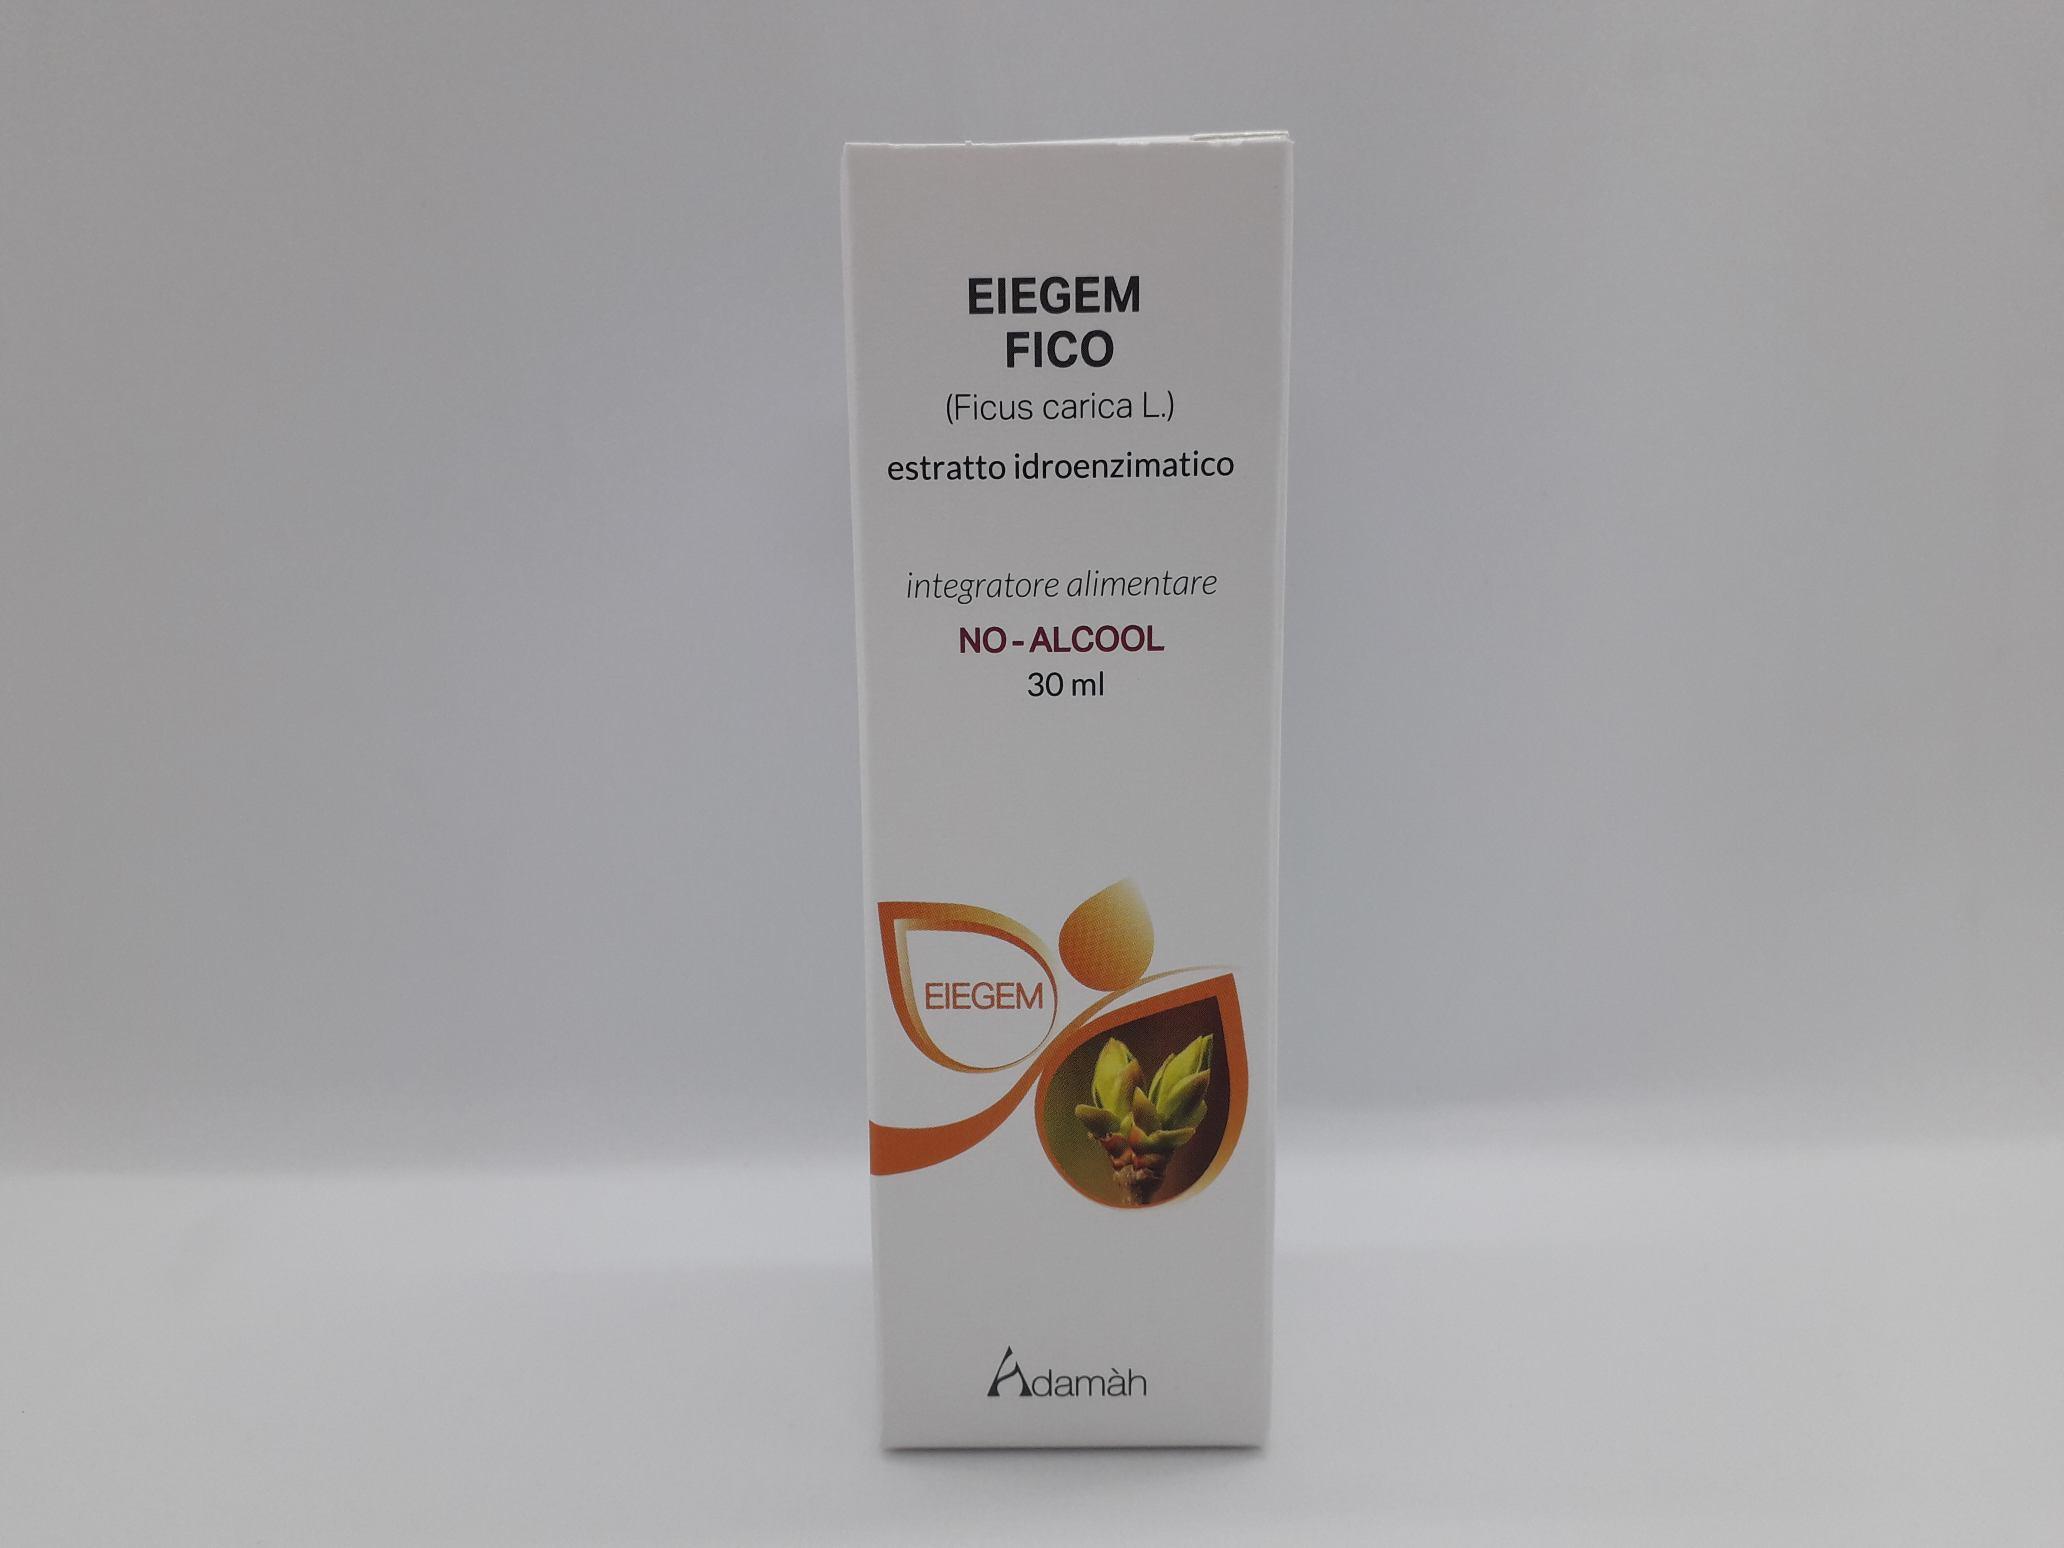 EIEGEM FICO 30 ML - Farmaciaempatica.it